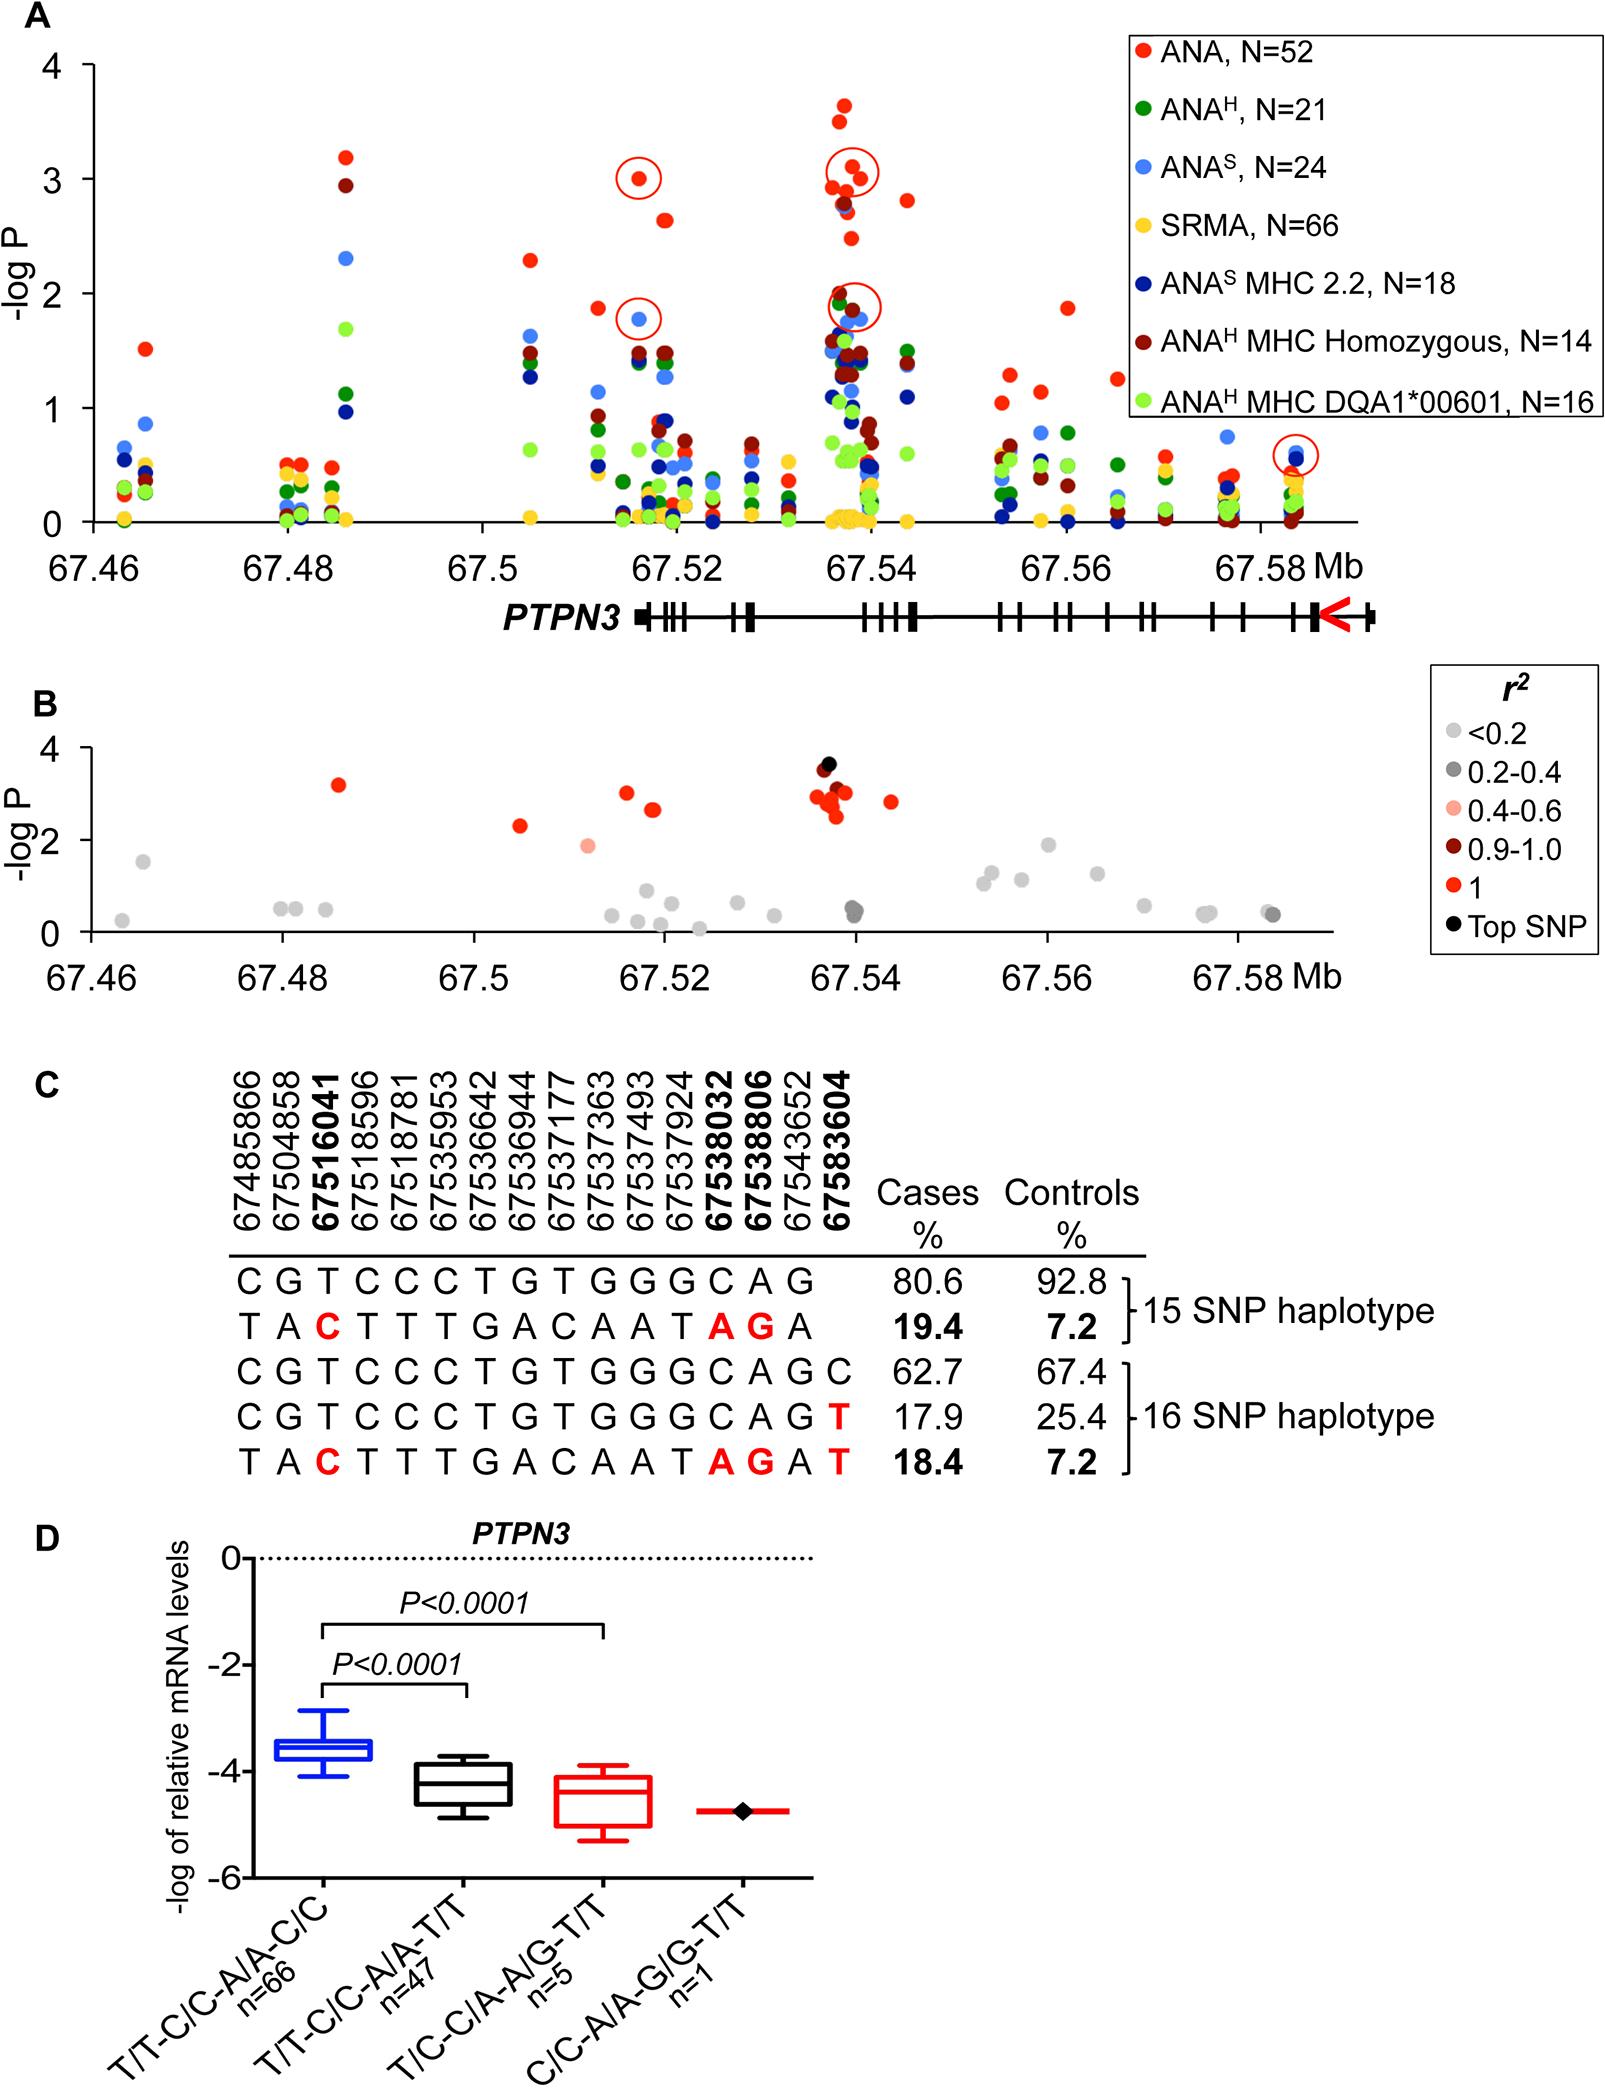 Genetic analysis of chromosome 11 locus and <i>PTPN3</i> expression.